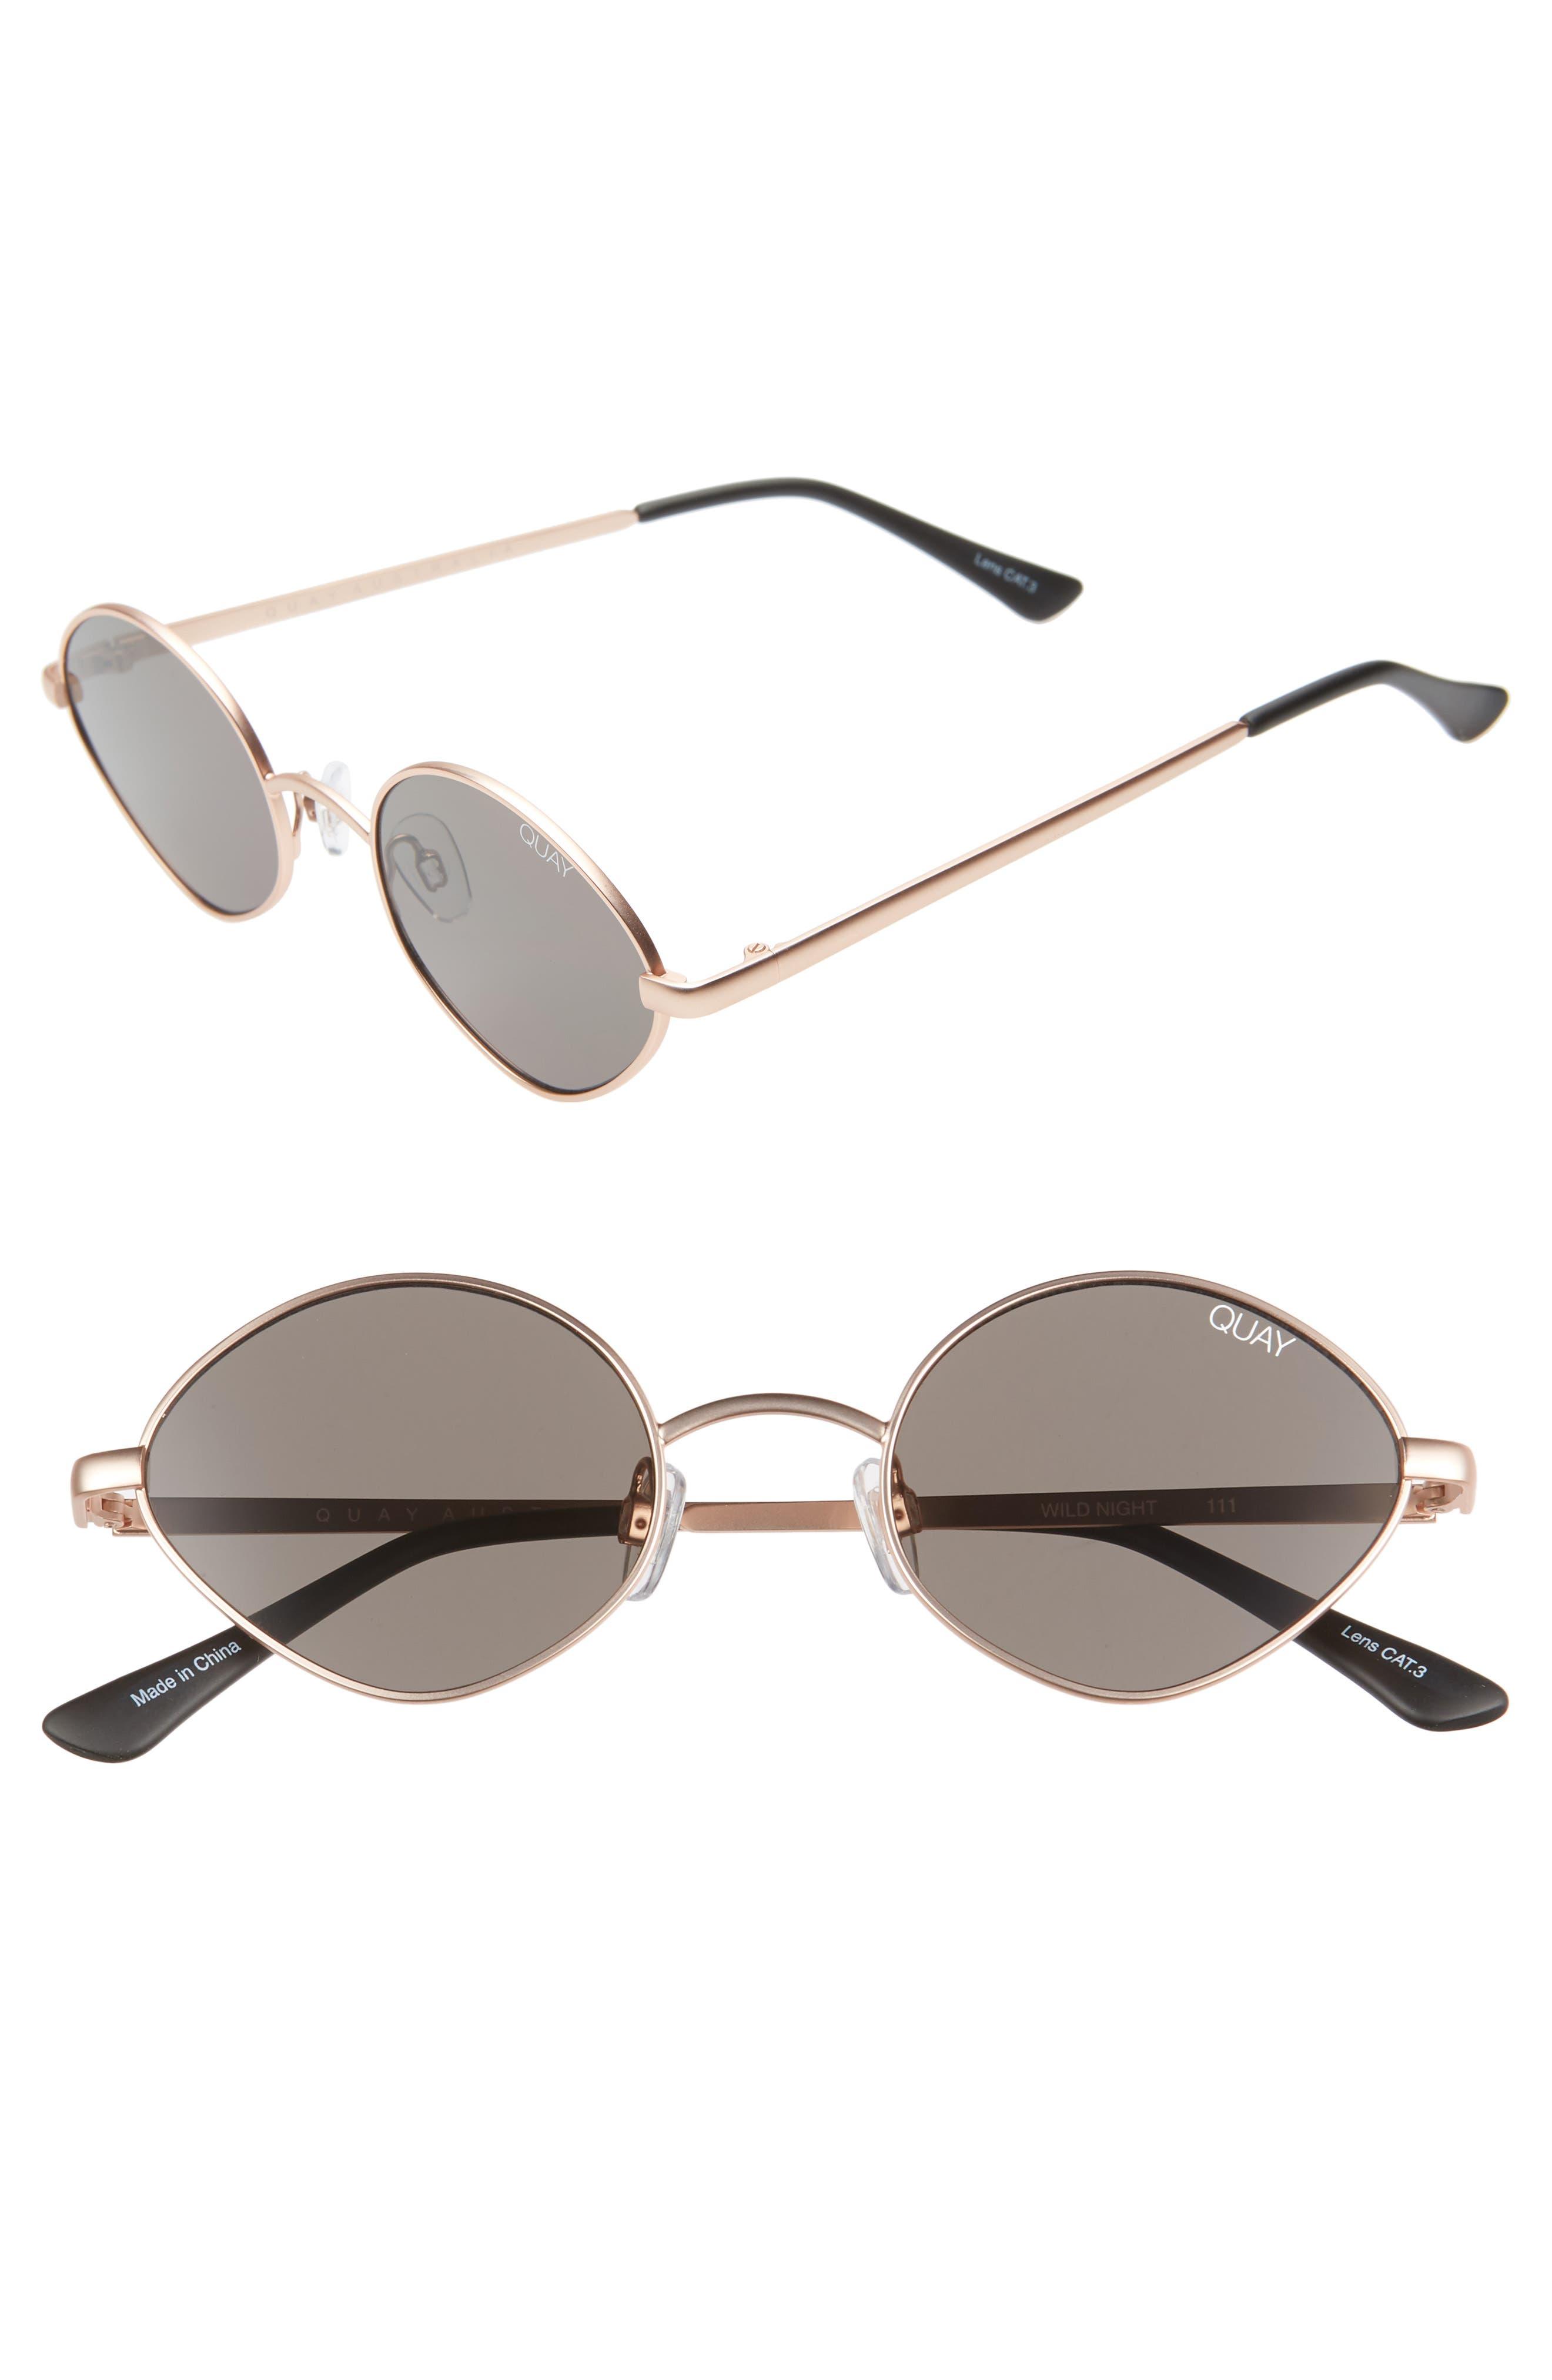 Quay Australia Wild Night 55Mm Teardrop Sunglasses - Rose Gold/ Smoke